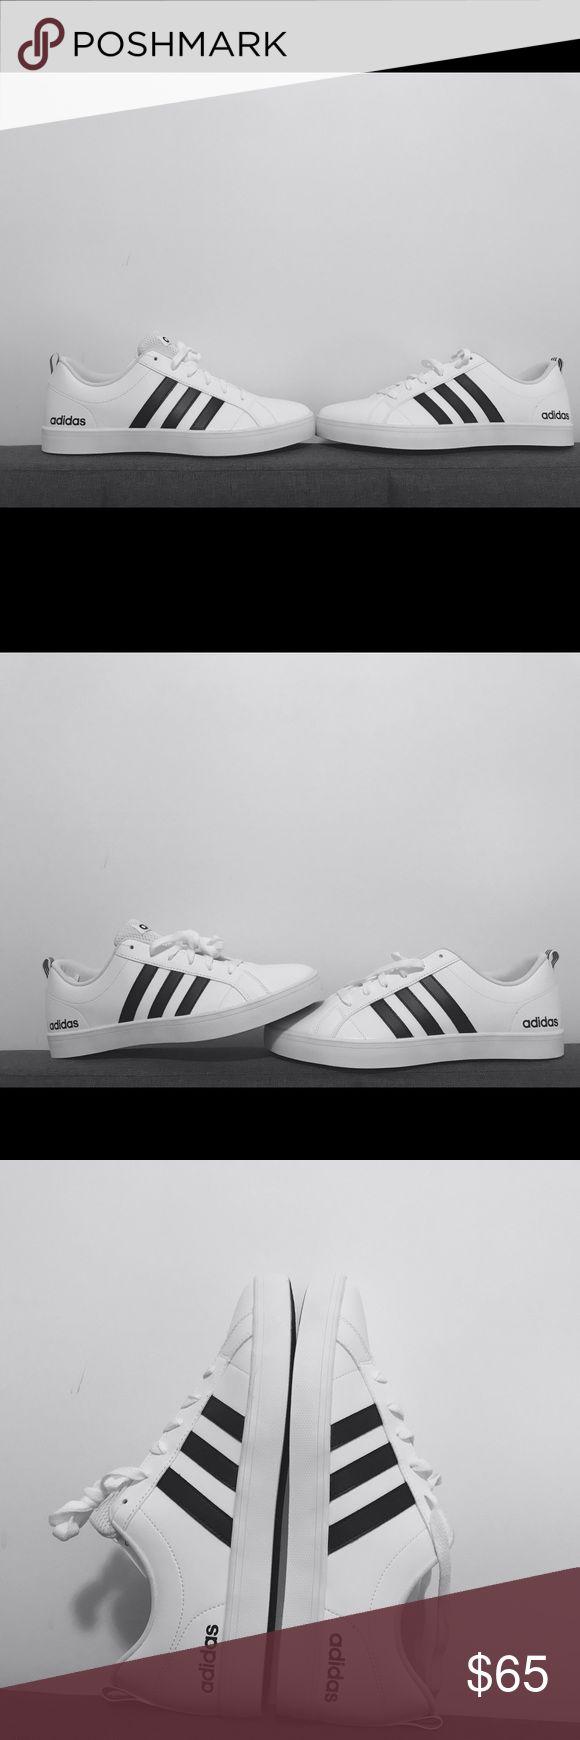 NEW Adidas Original Sneakers! Size 11 White, Size 11 Adidas Sneakers adidas Shoes Sneakers